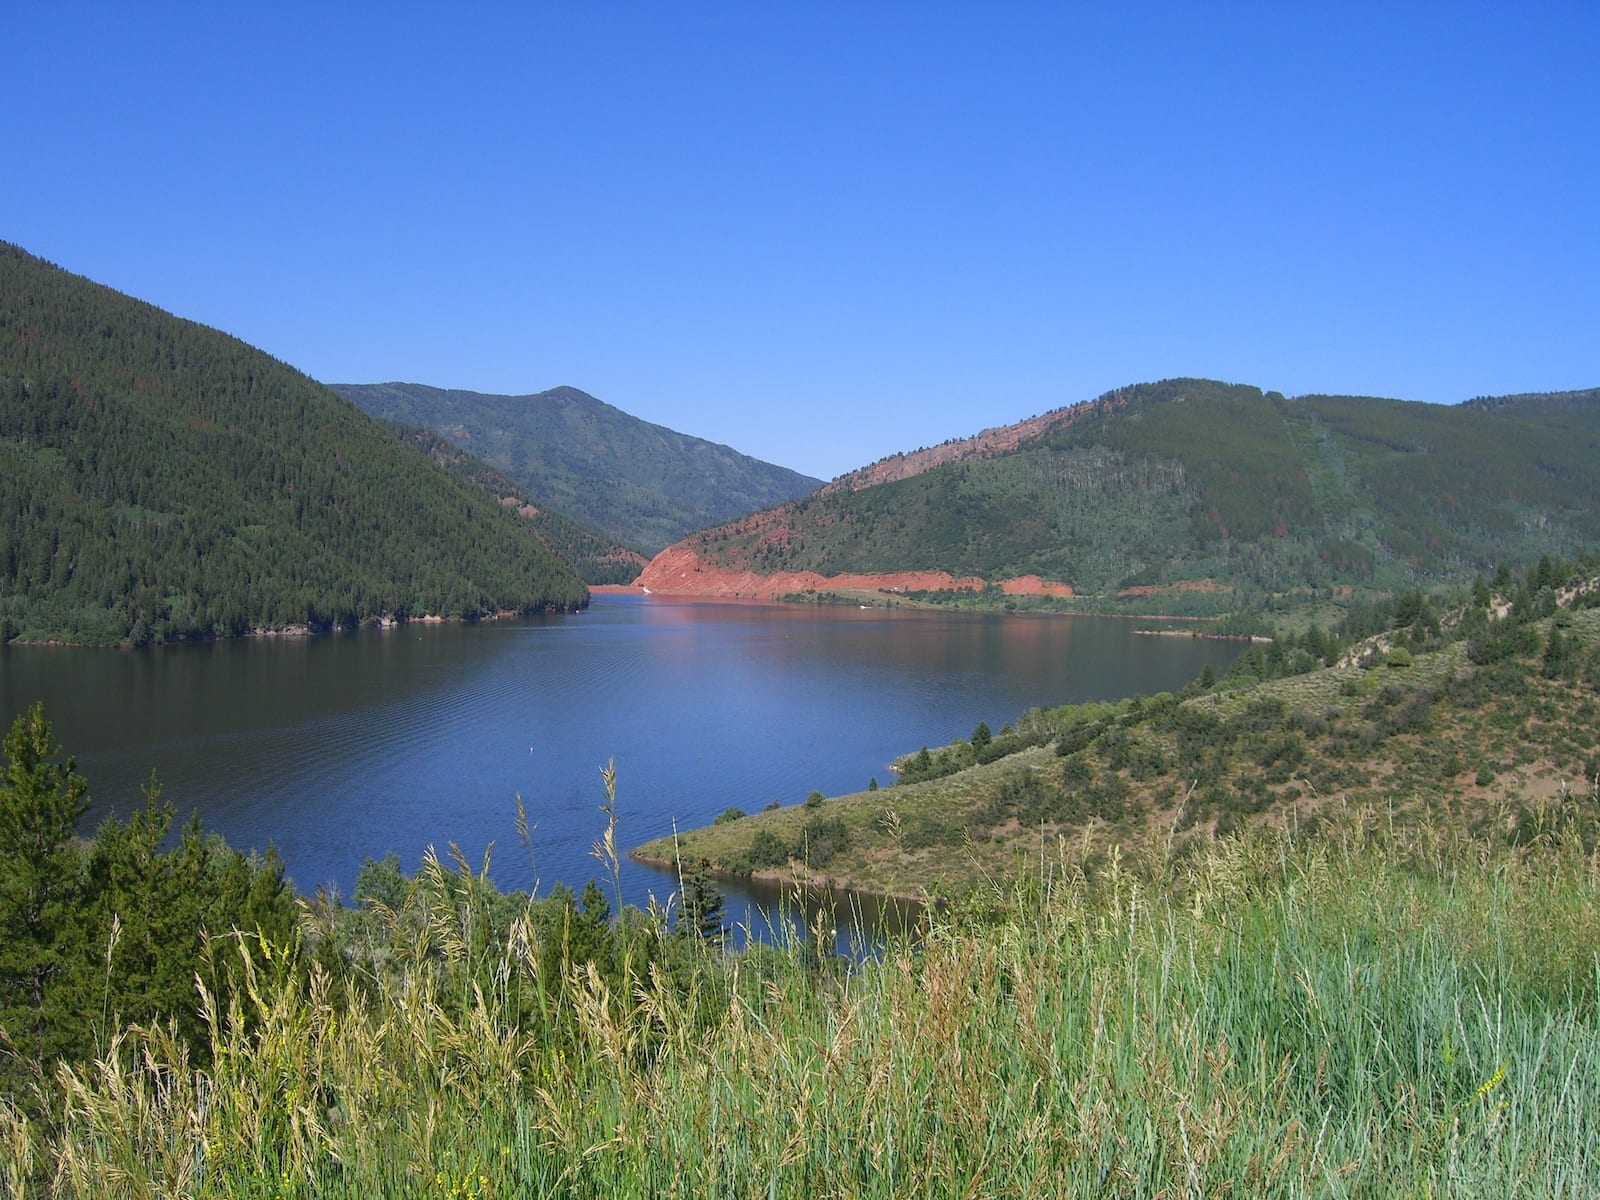 Camping near Basalt Ruedi Reservoir Colorado